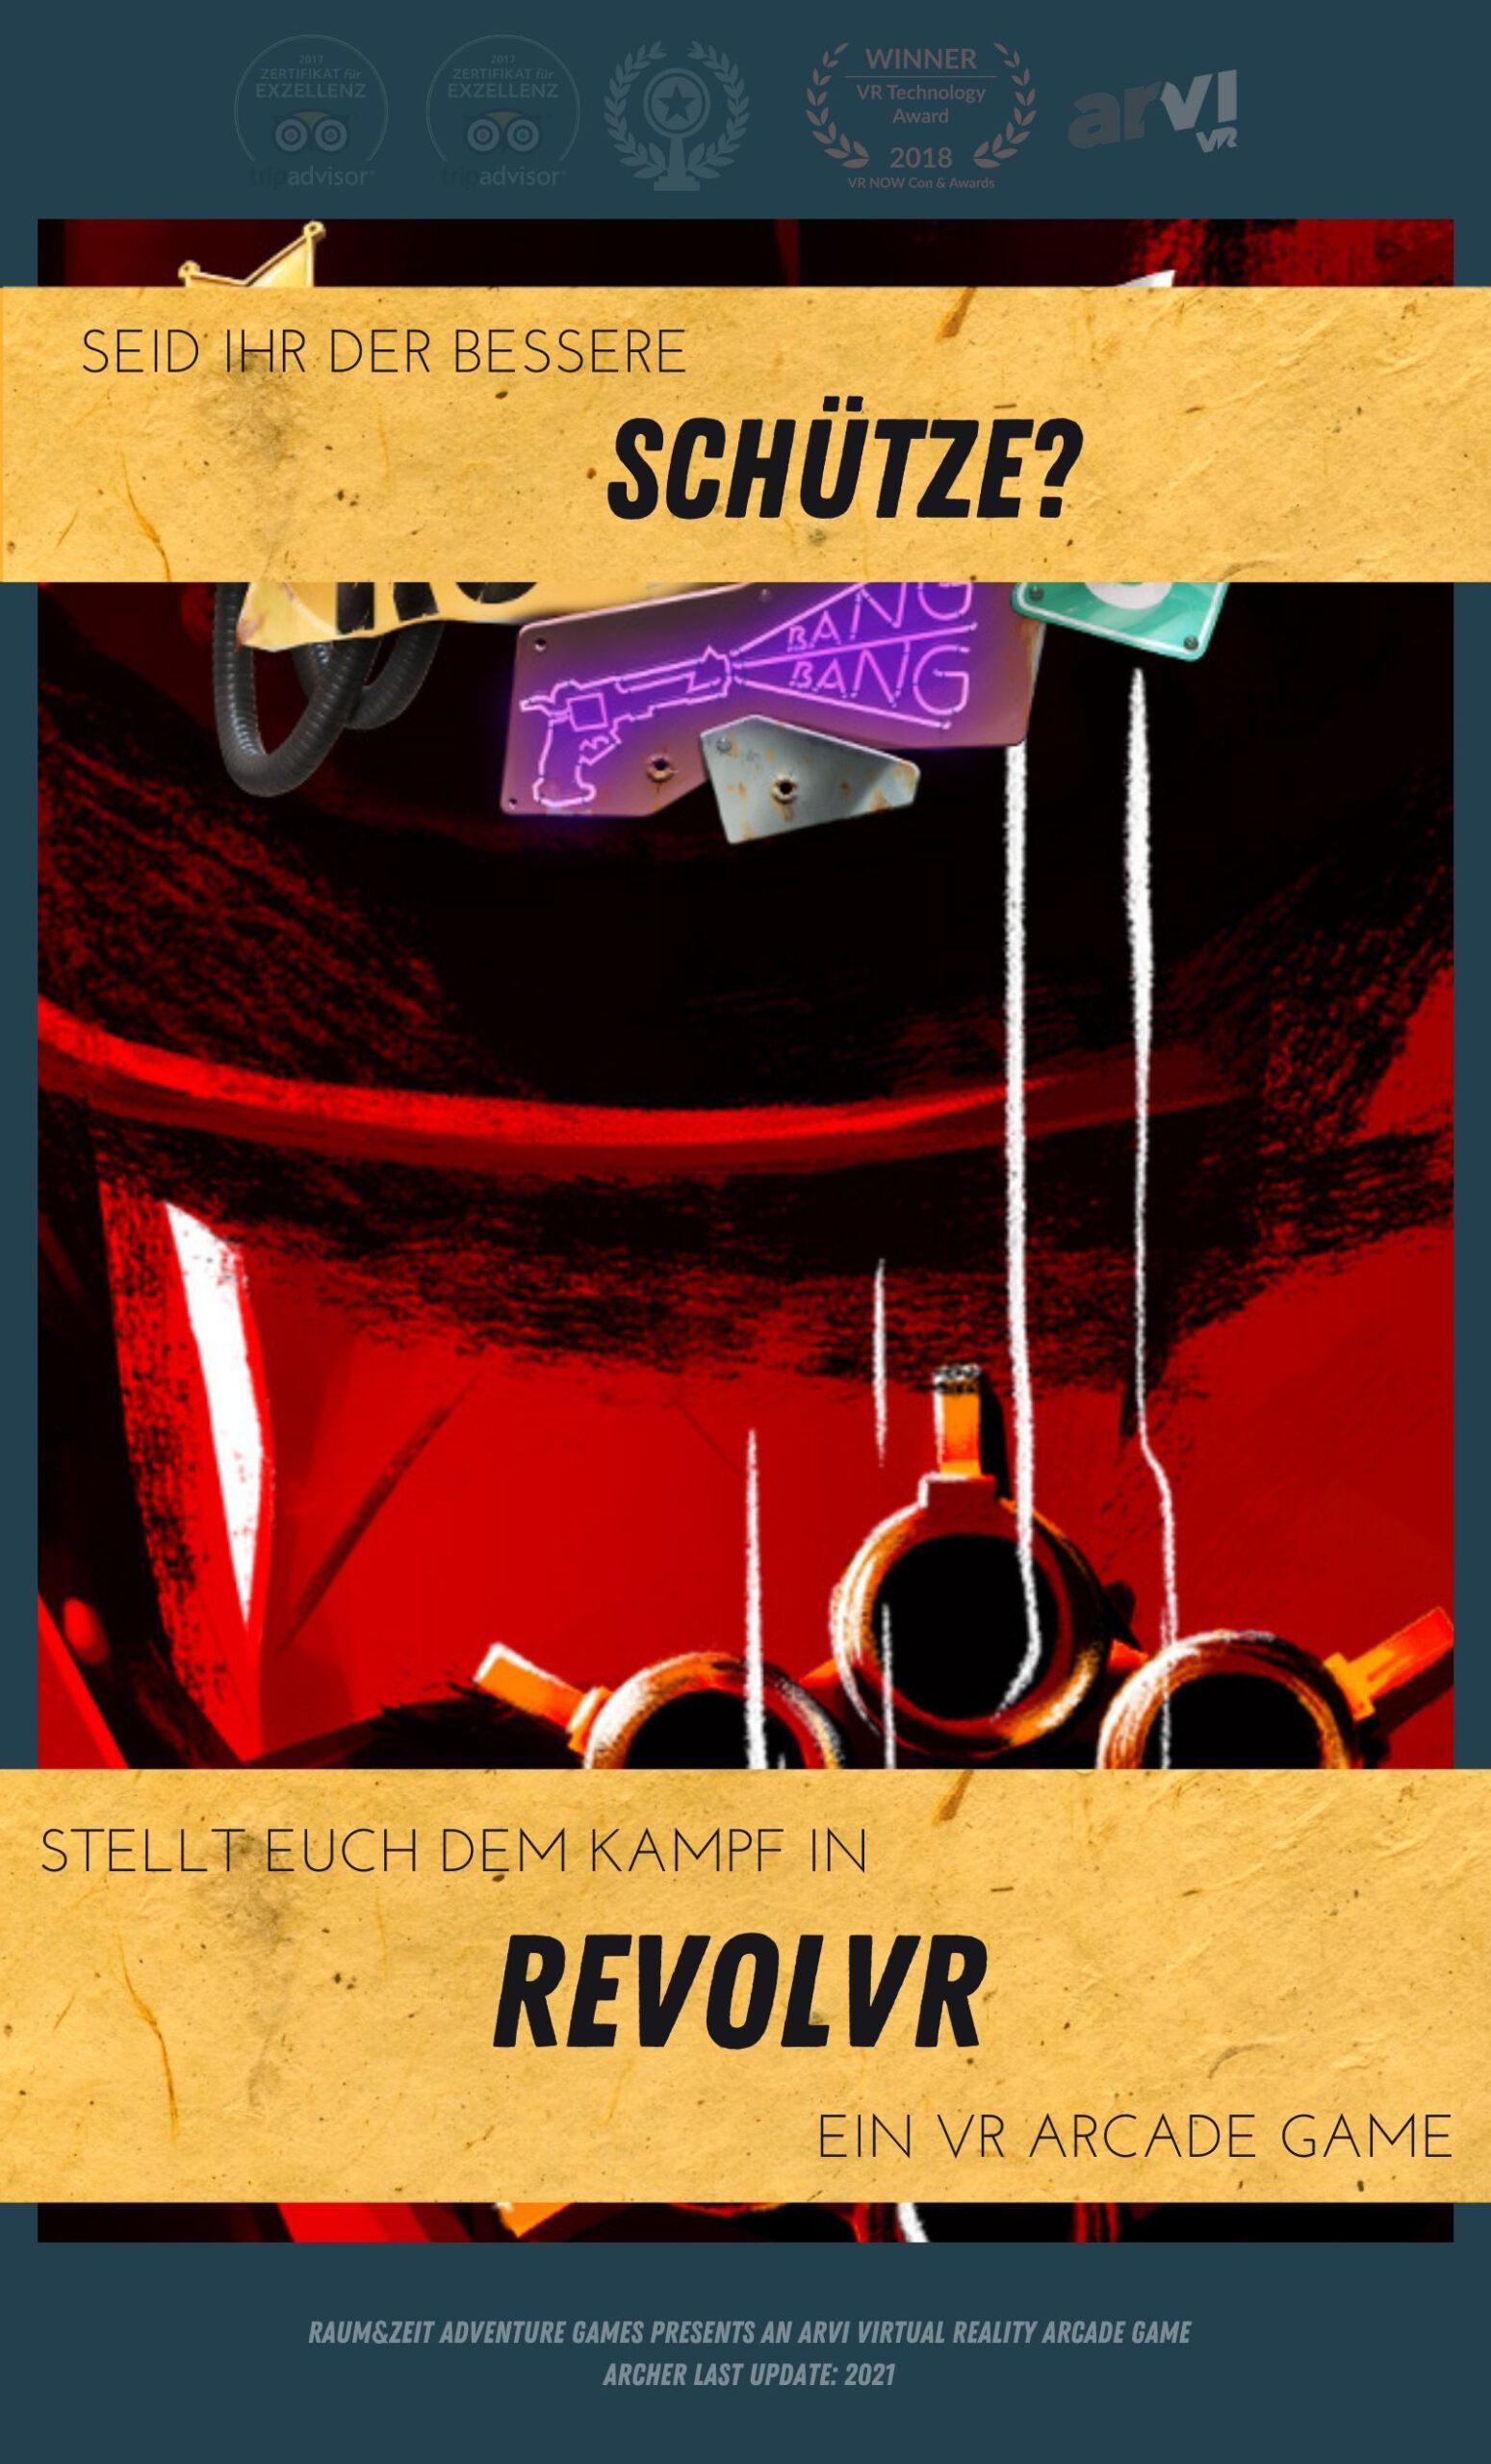 RevolVR-scaled.jpg